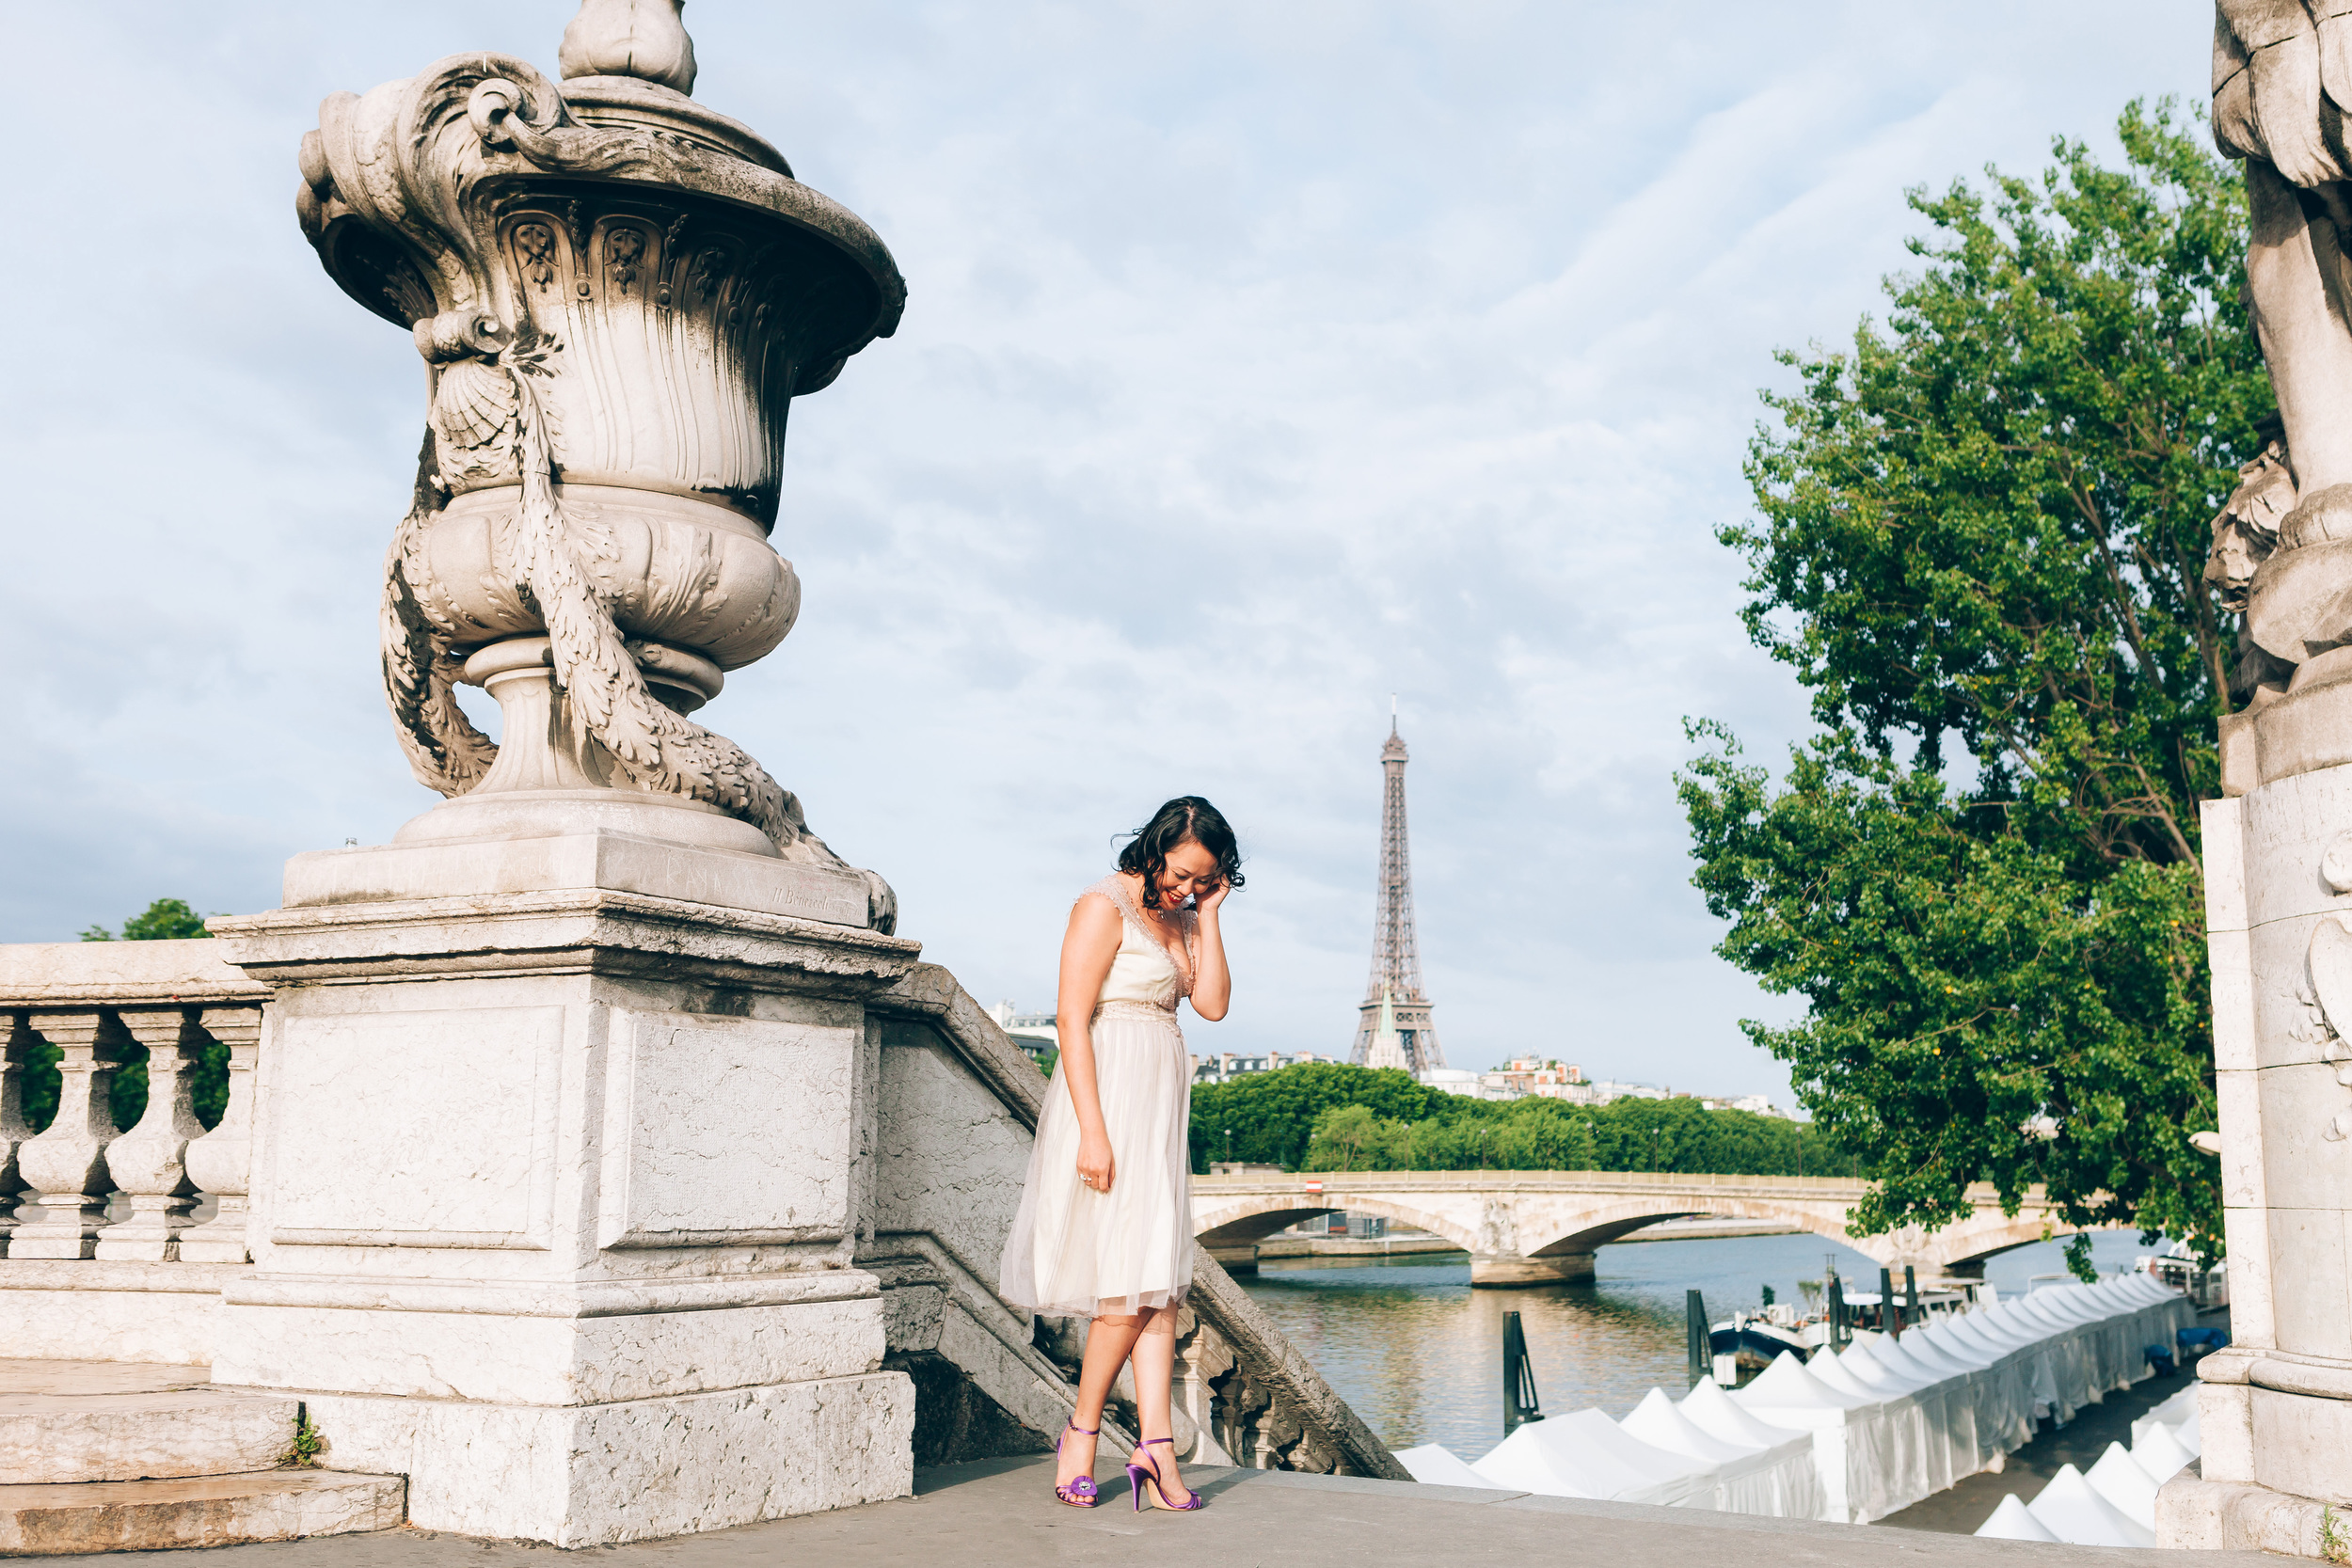 Photographer in Paris, Alexander 3 bridge, Birthday, personal branding, IheartParisfr